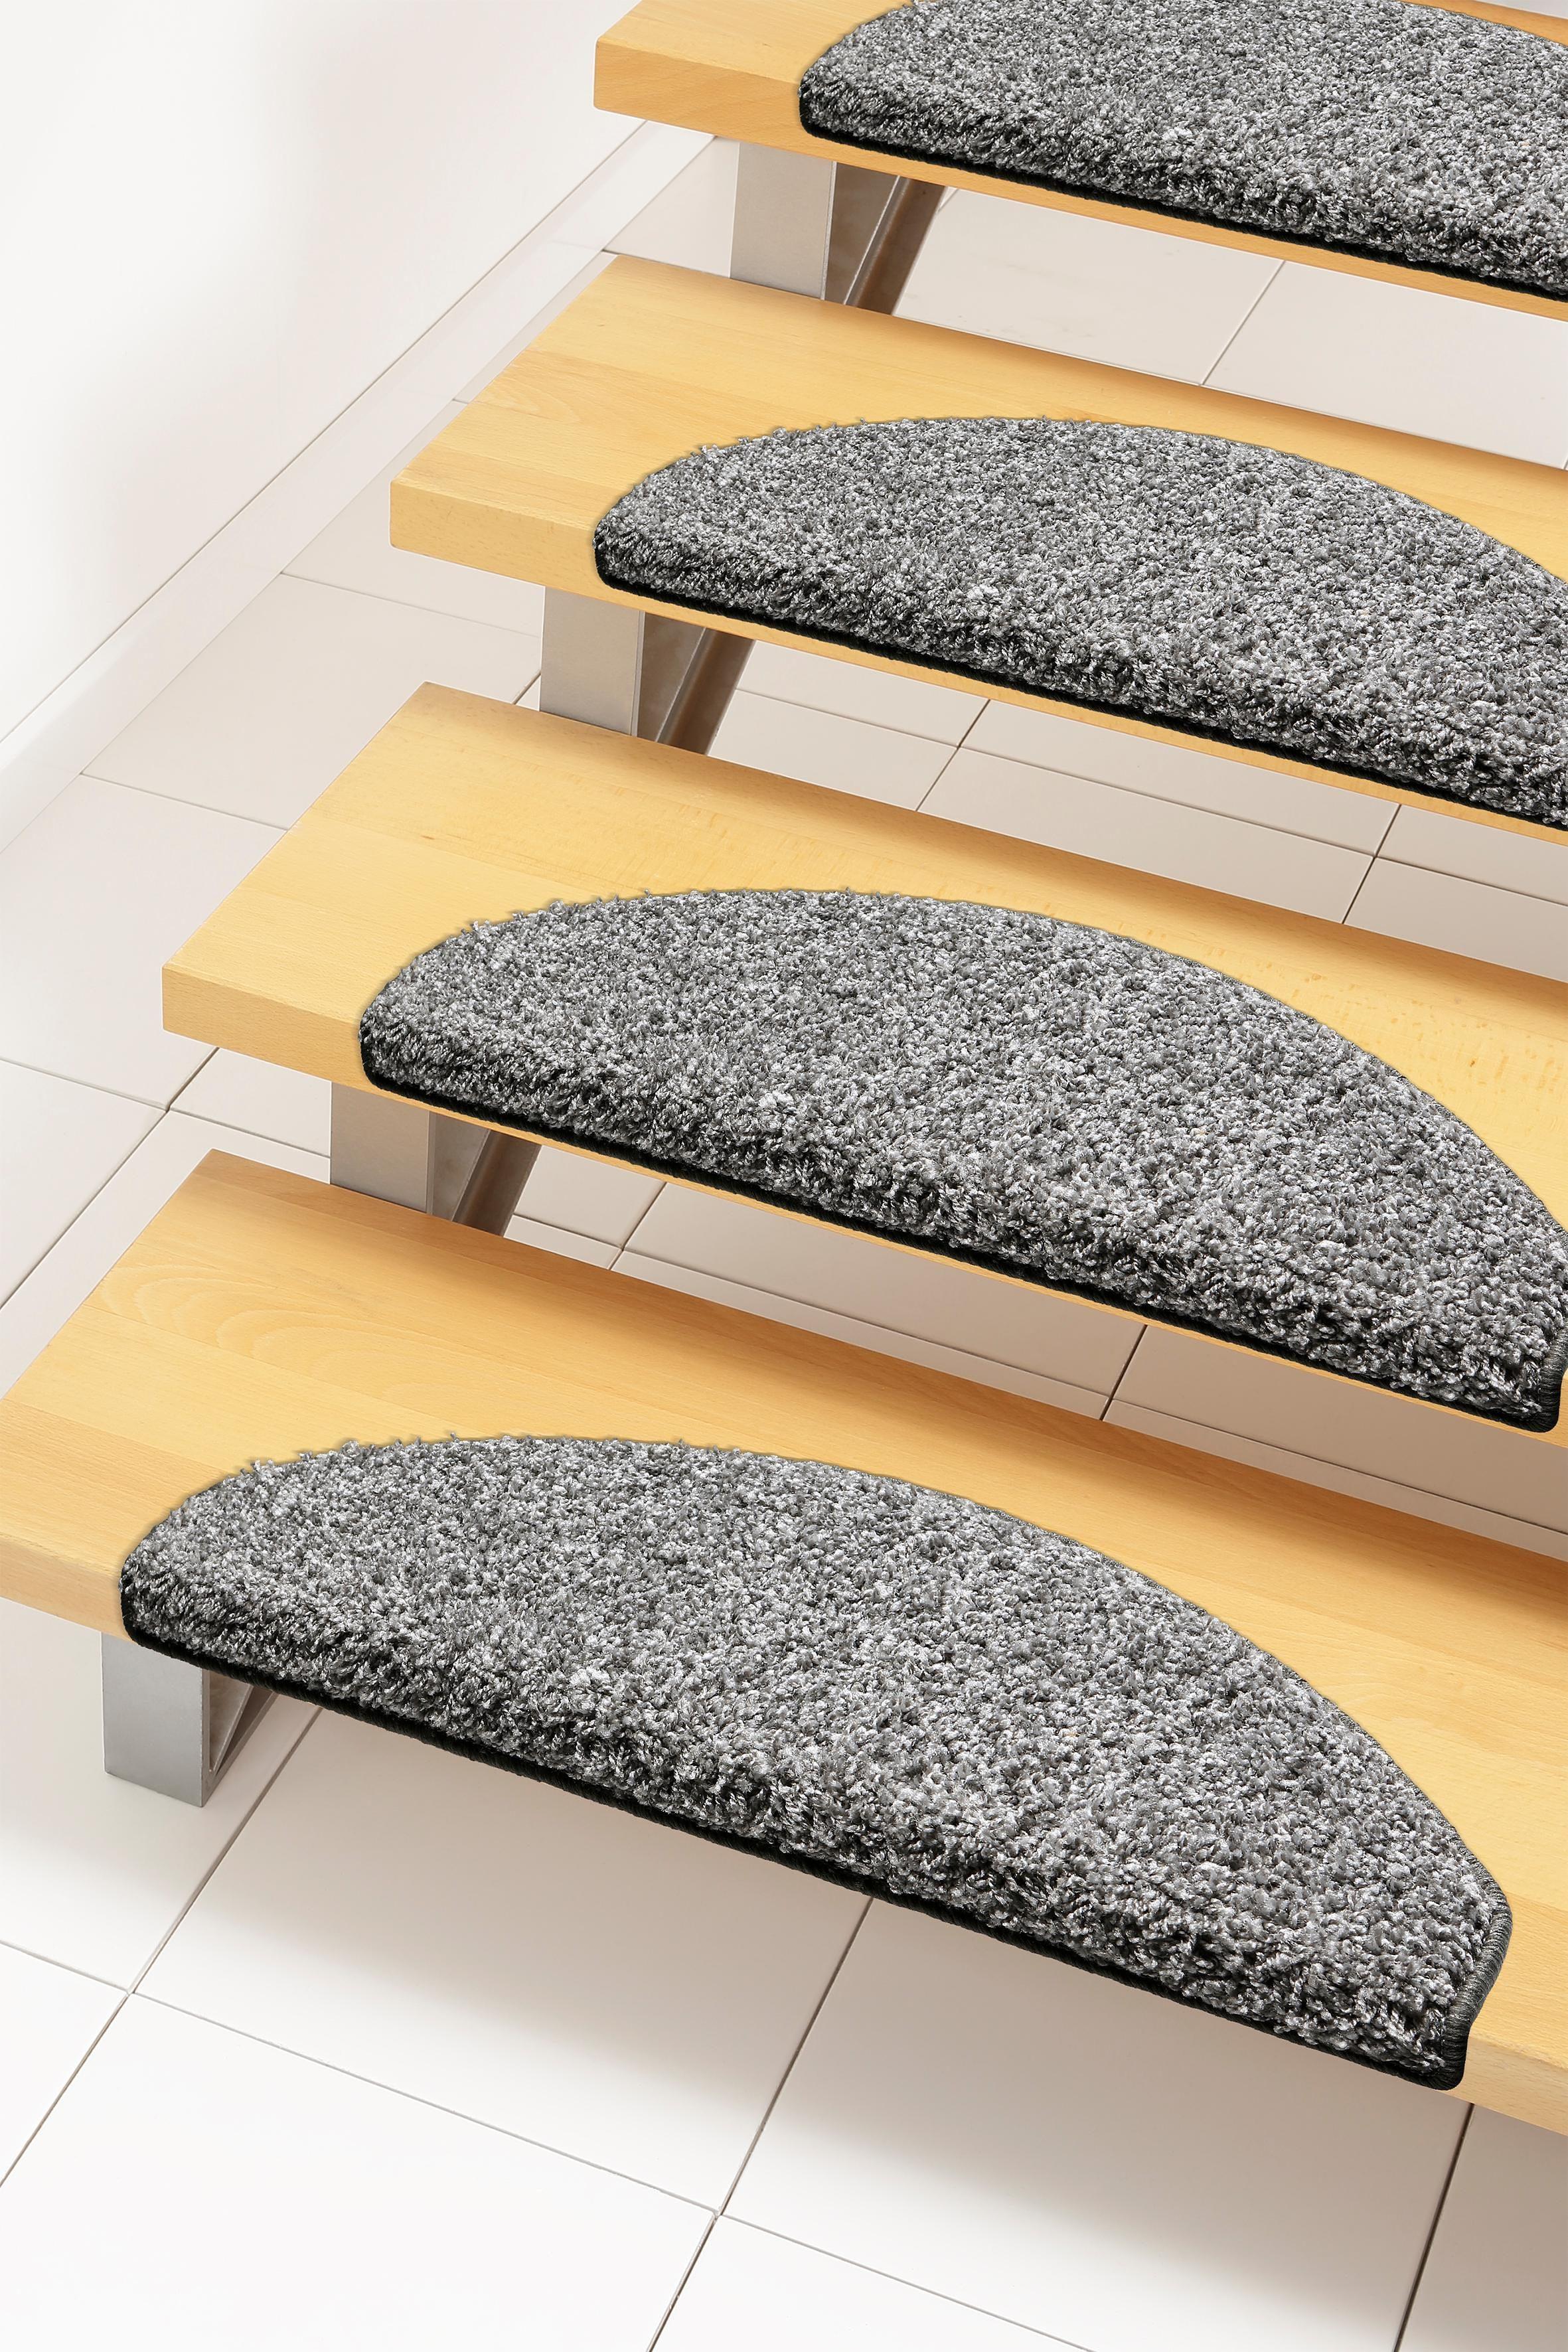 Stufenmatte Kopenhagen Andiamo stufenförmig Höhe 15 mm maschinell getuftet